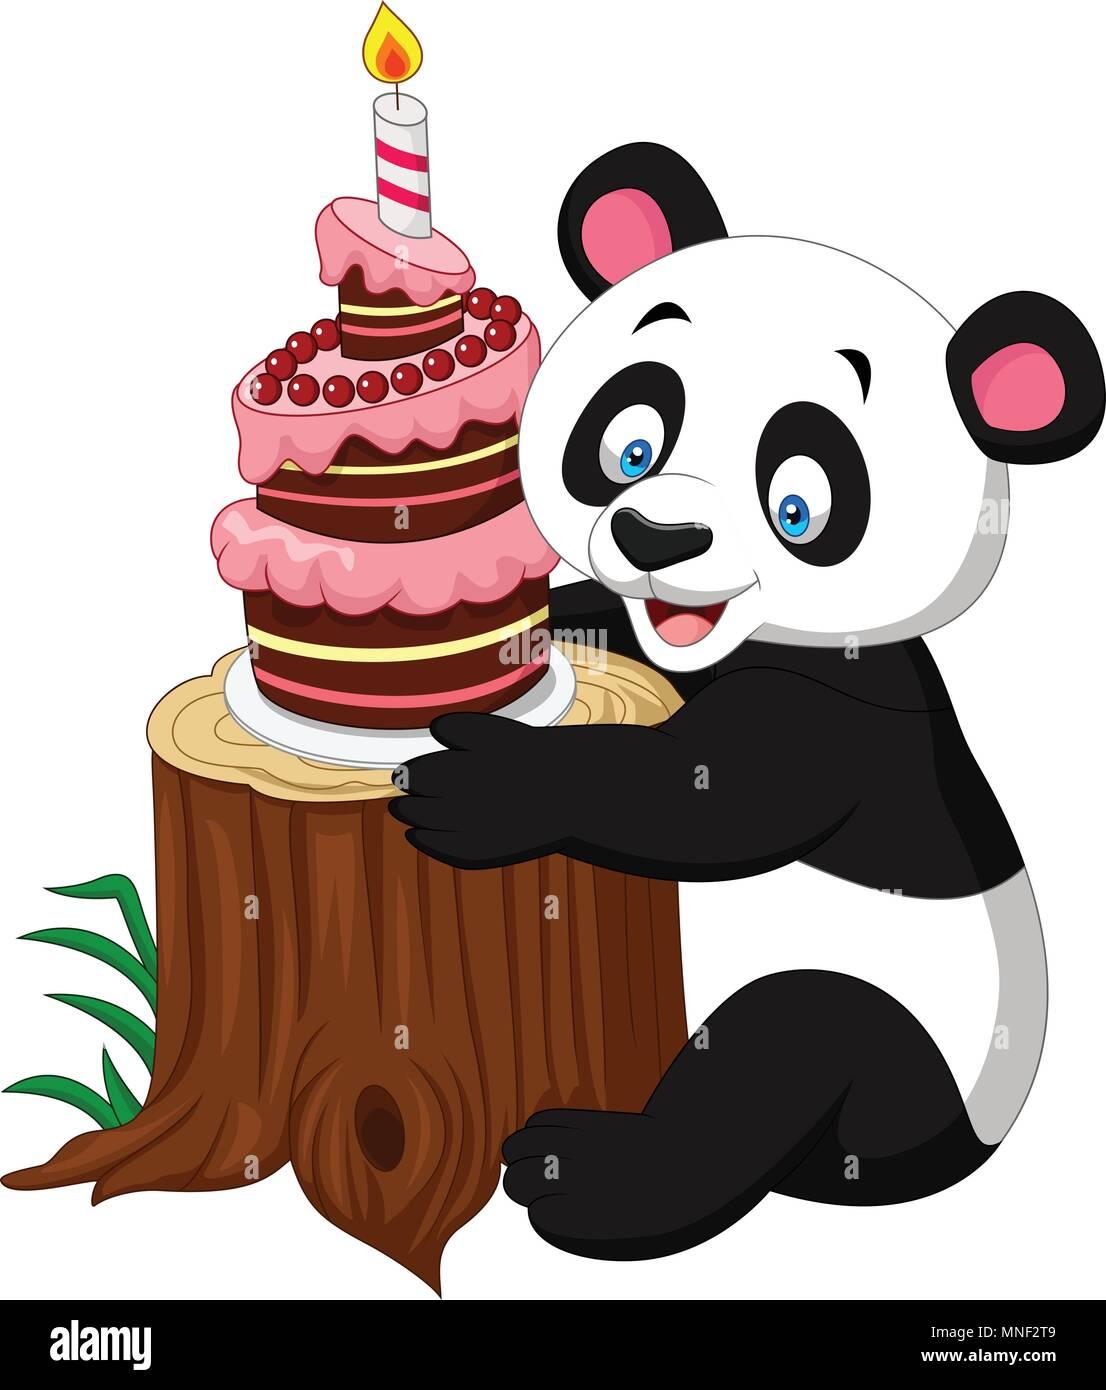 Fine Cartoon Funny Panda With Birthday Cake Stock Vector Art Funny Birthday Cards Online Alyptdamsfinfo